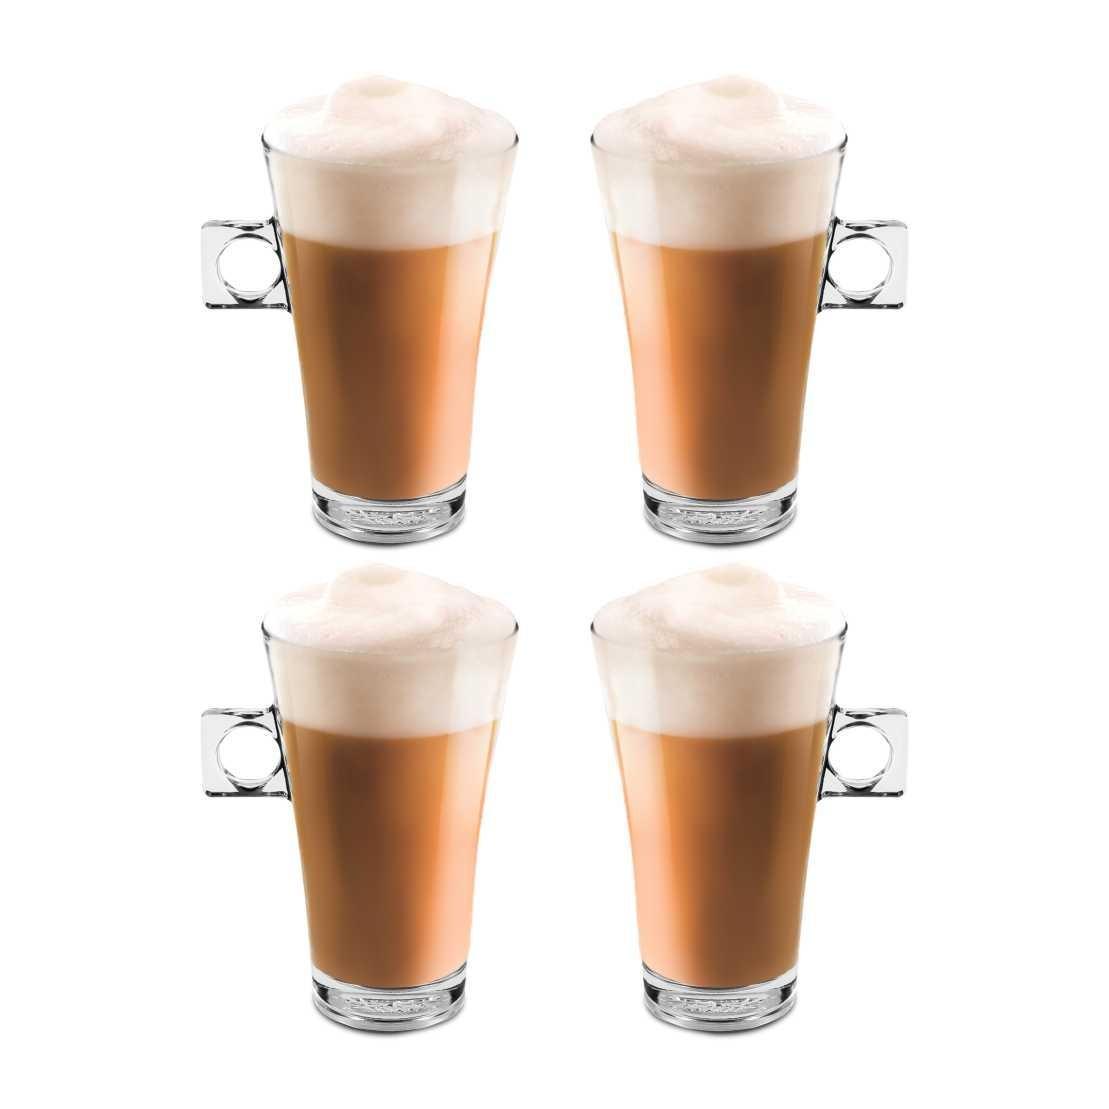 Kit Taças Minhas Bebidas Dolce Gusto- 4 unidades